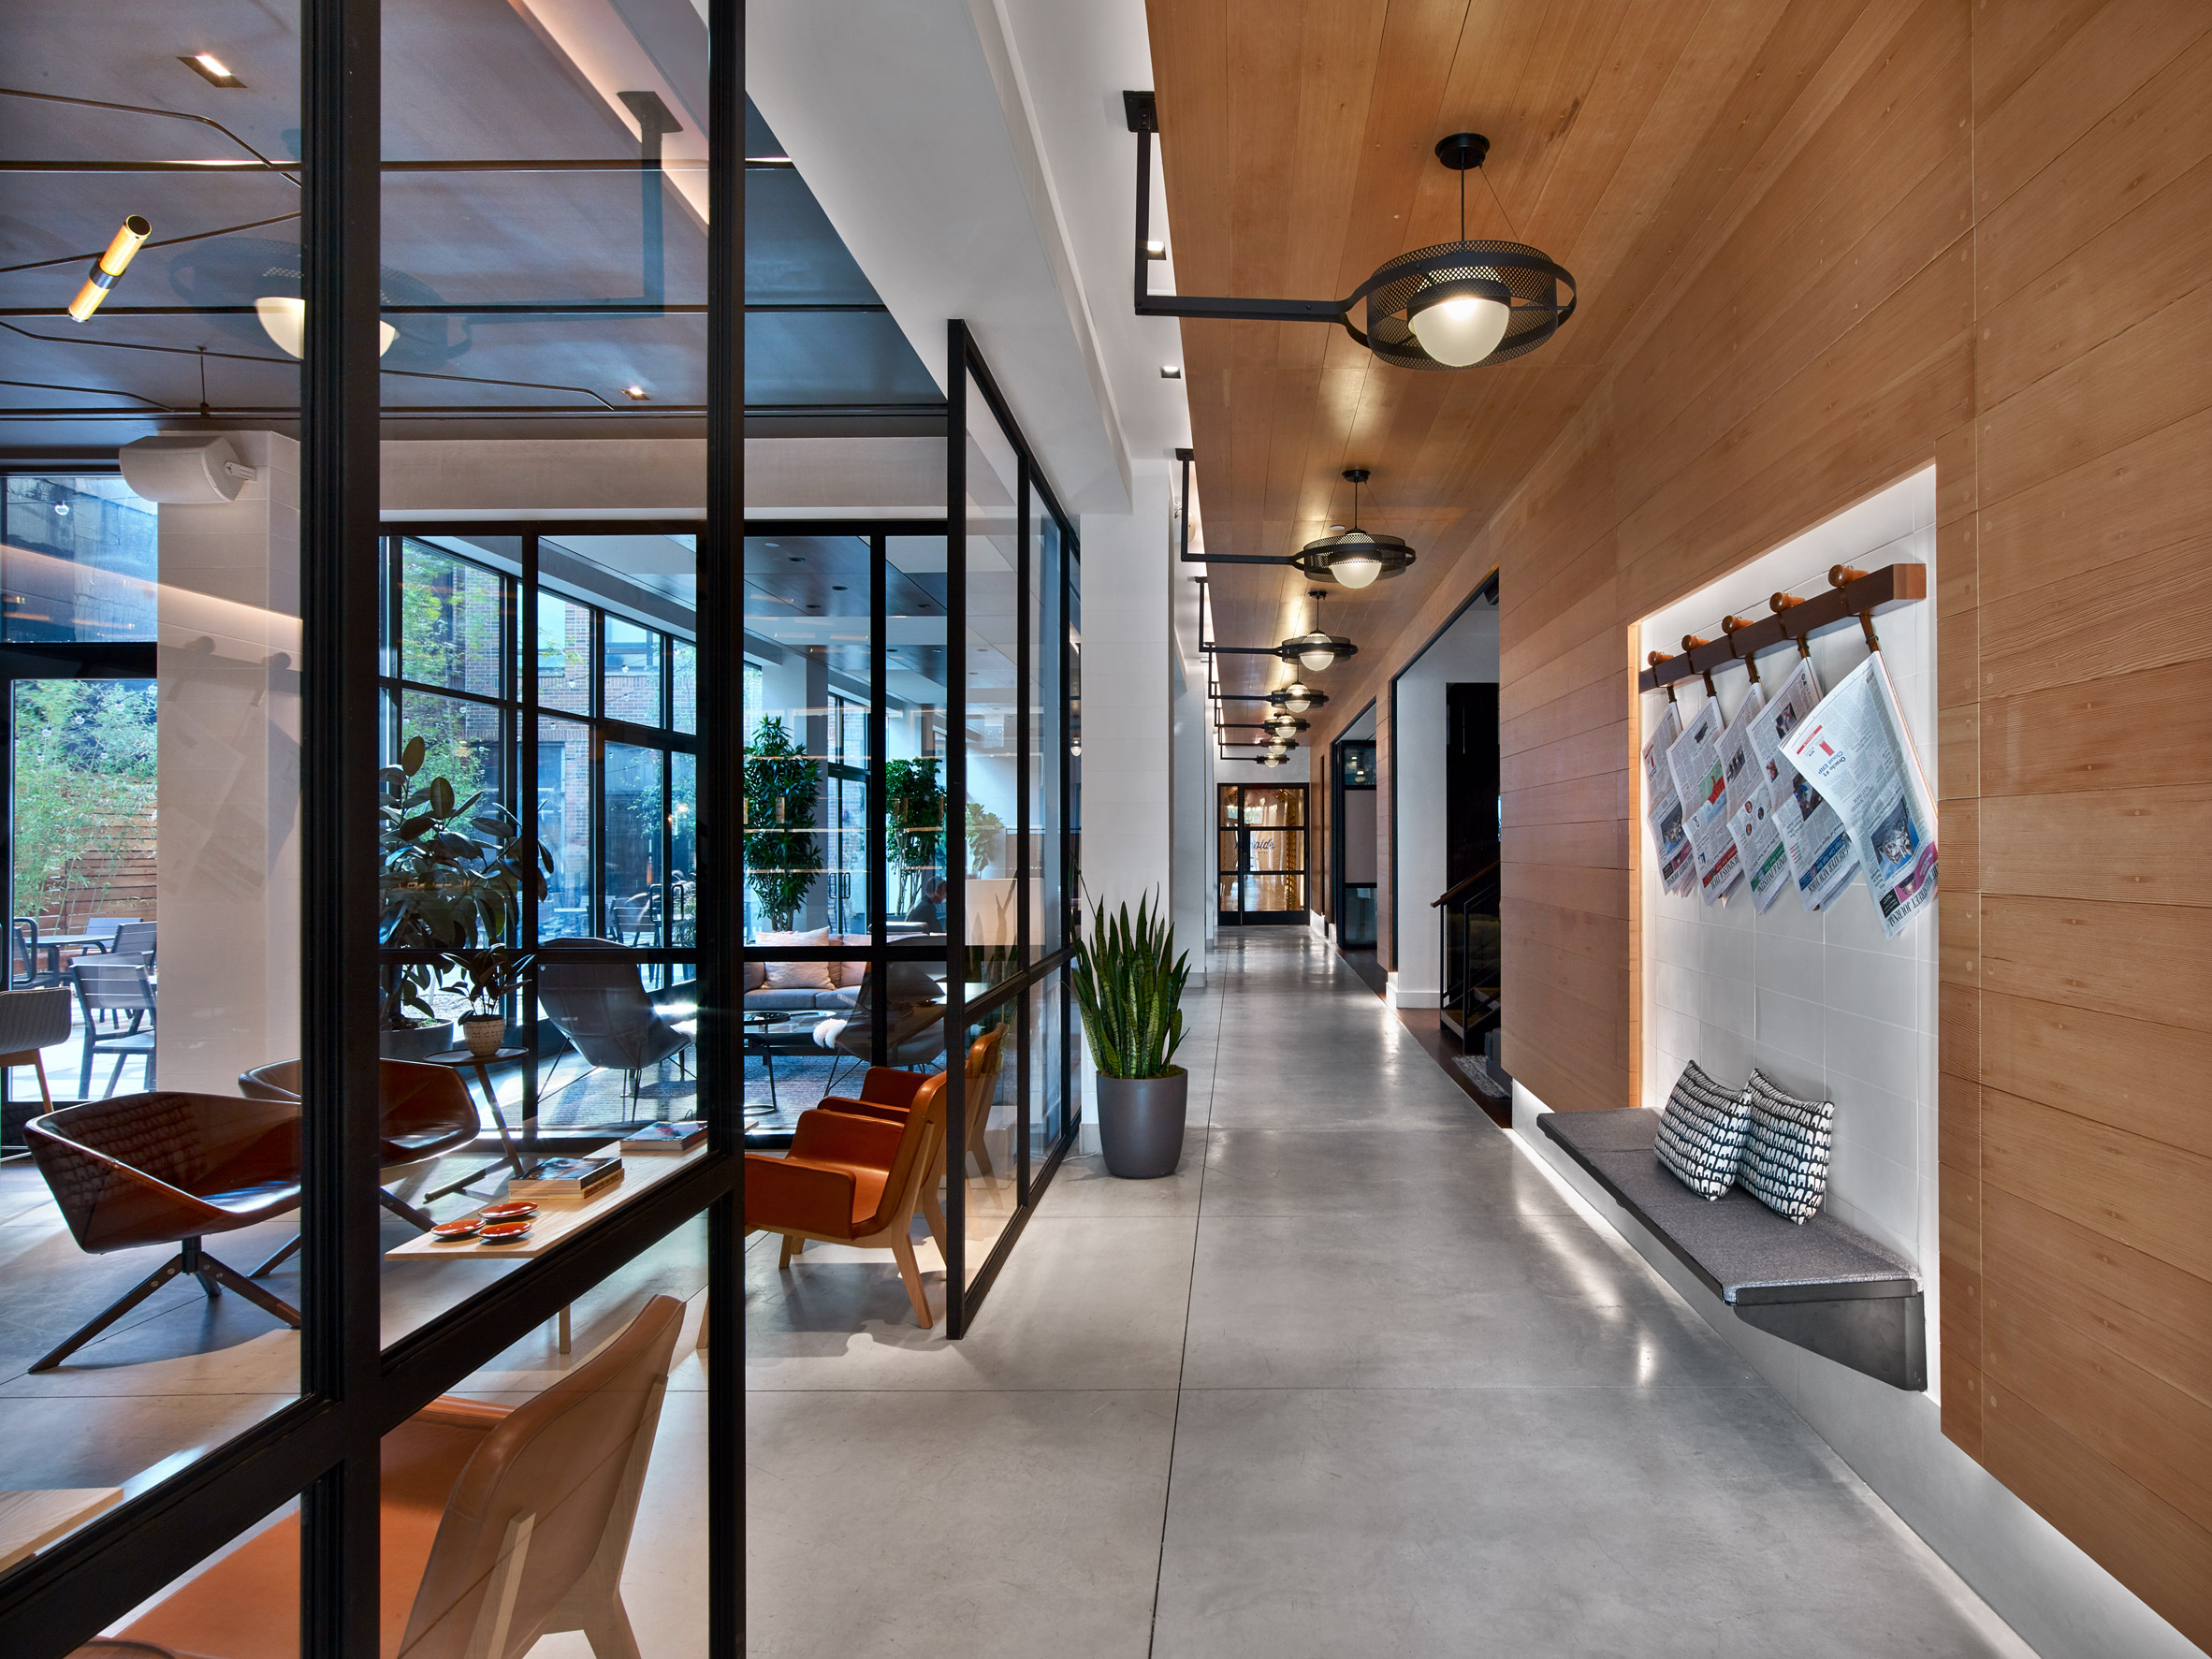 architecture-new-york-city-micro-hotel-design-studia-interiors-osnovadesign-osnova-poltava_02